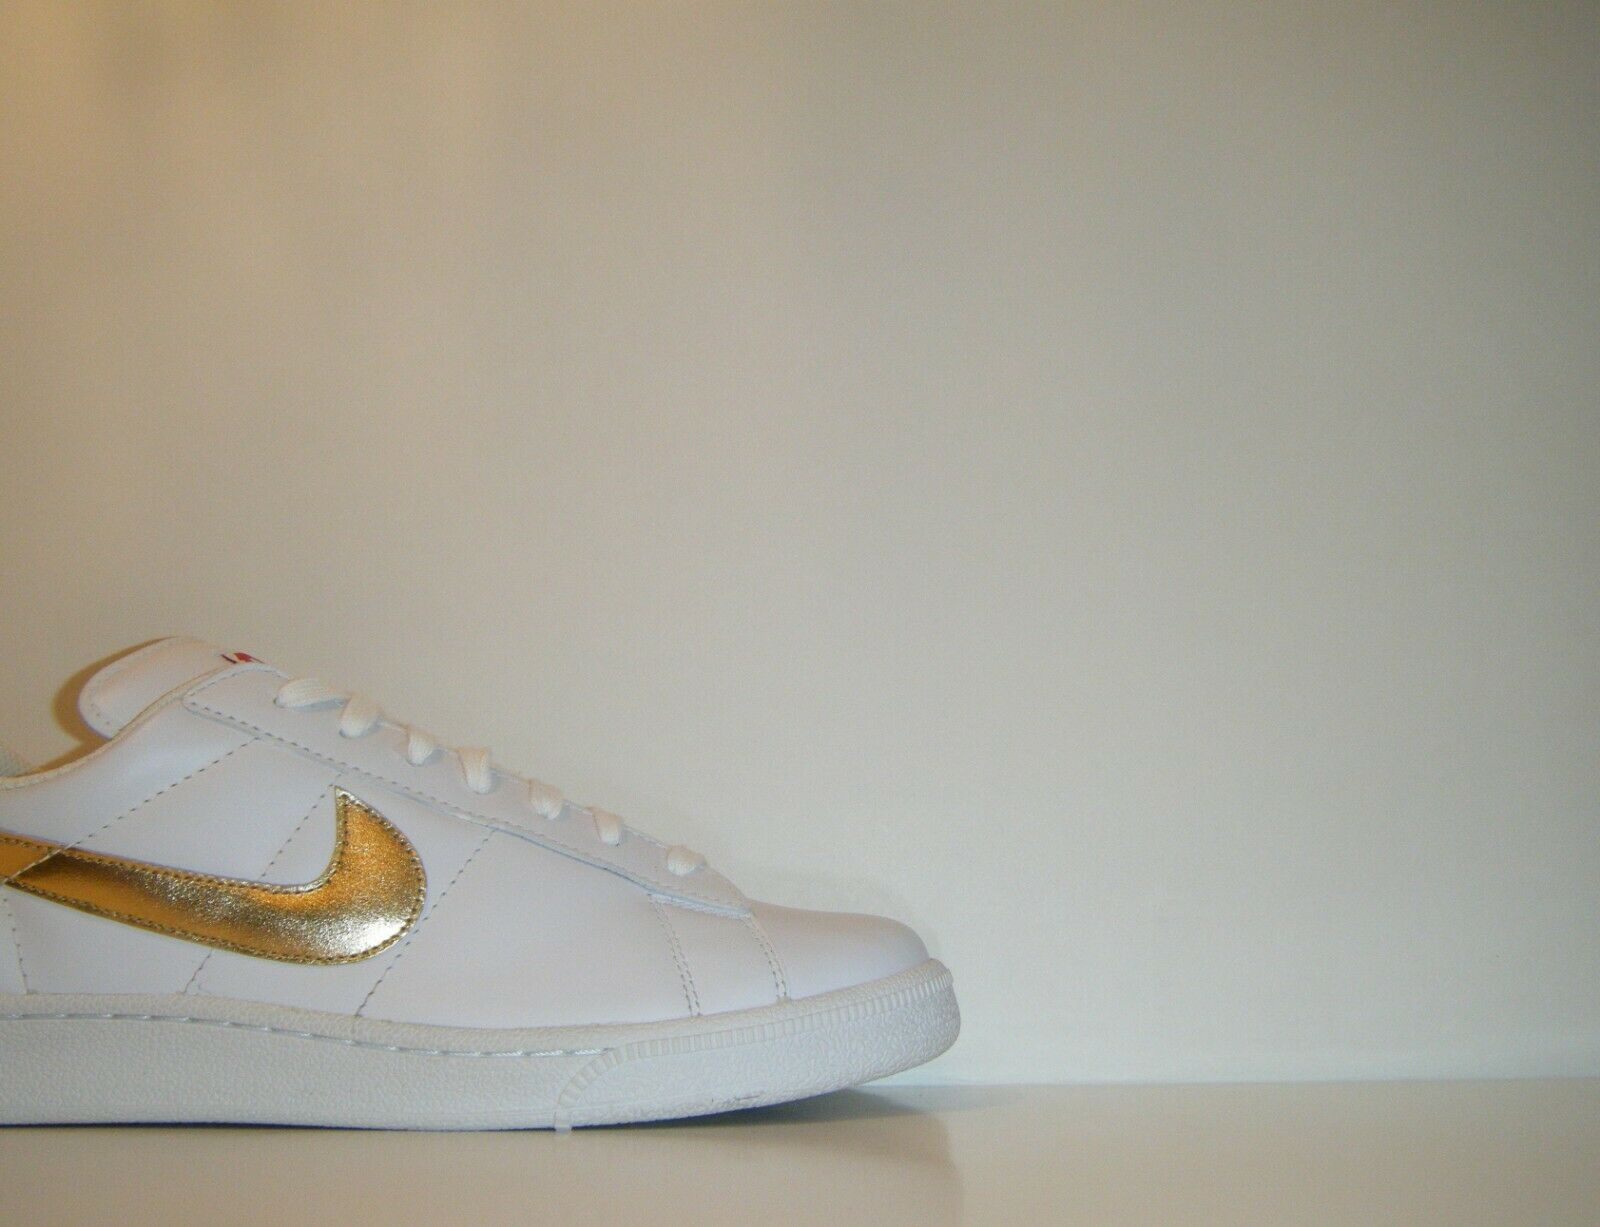 2011 Nike Tennis Classic YOTR Year Of The Rabbit gold Sz. 9 SB Sample 438959-100